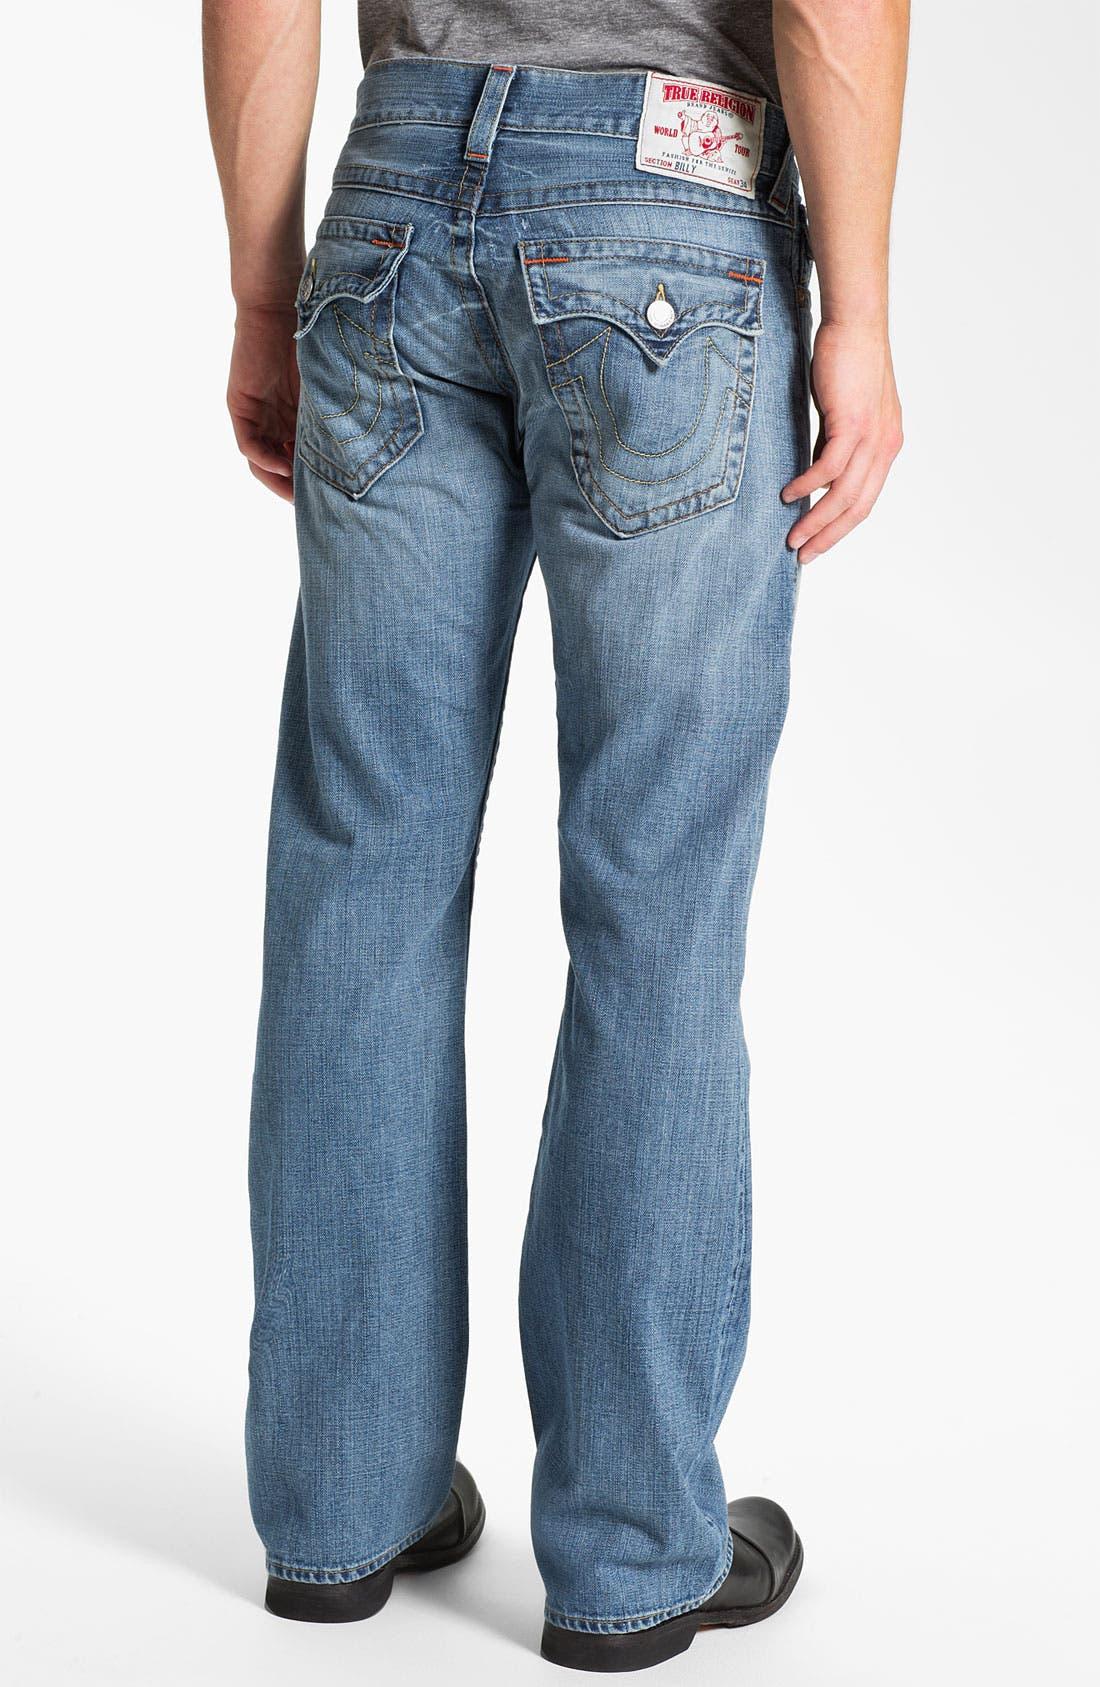 Alternate Image 1 Selected - True Religion Brand Jeans 'Billy' Bootcut Jeans (Vam Shade Horizon)